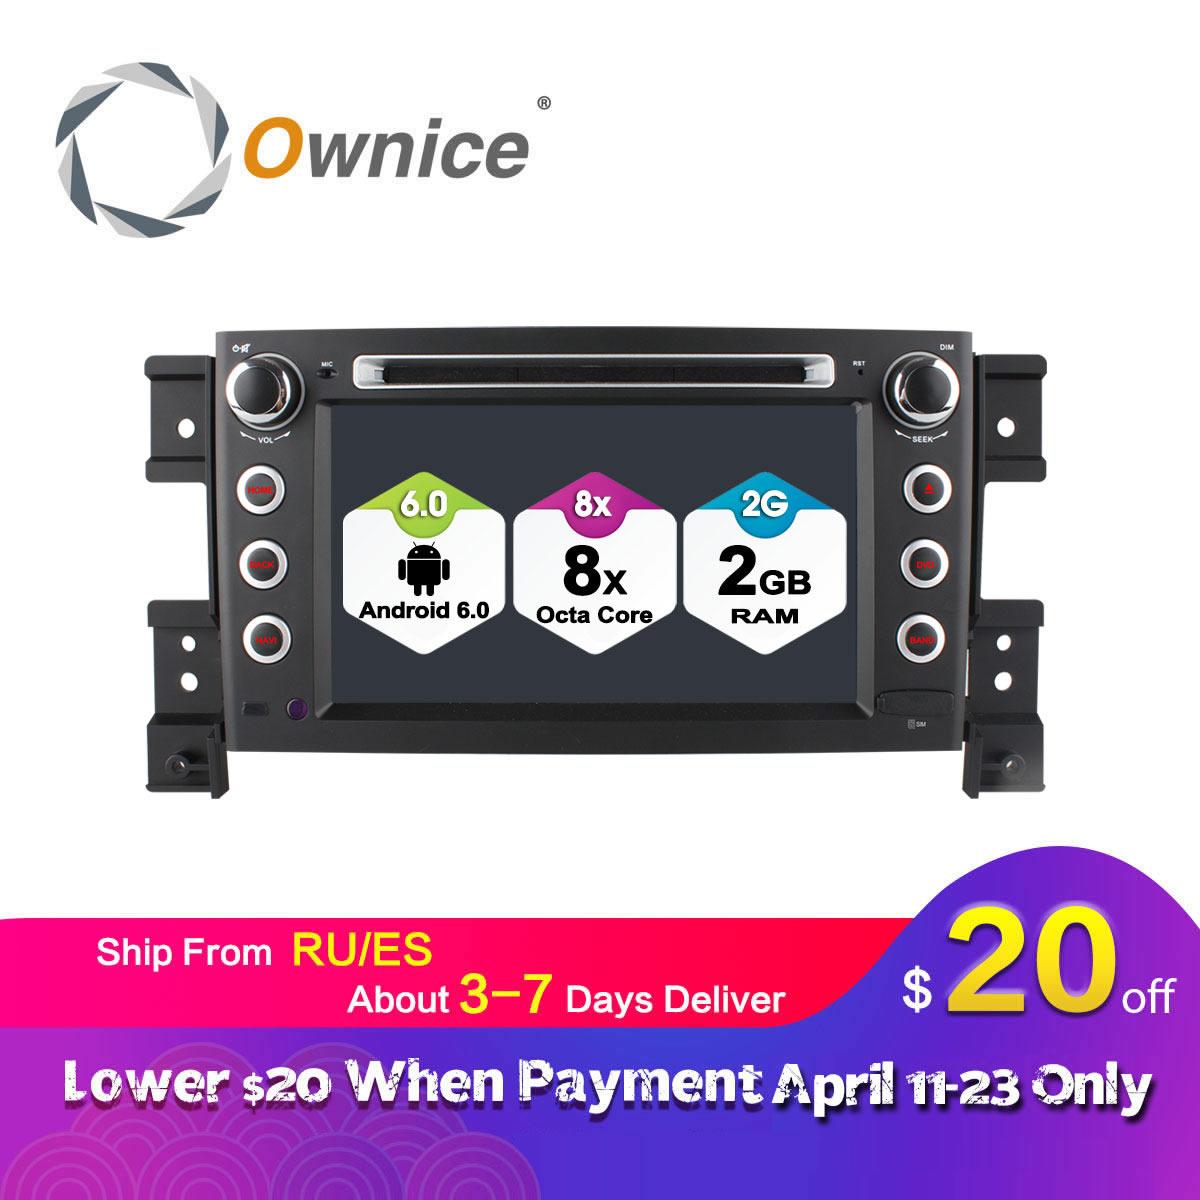 Ownice C500 Android 6.0 Octa 8 Core lecteur DVD de Voiture pour Suzuki Grand Vitara Android 6.0 Wifi 4G GPS BT Radio 2 GB RAM 32 GB ROM